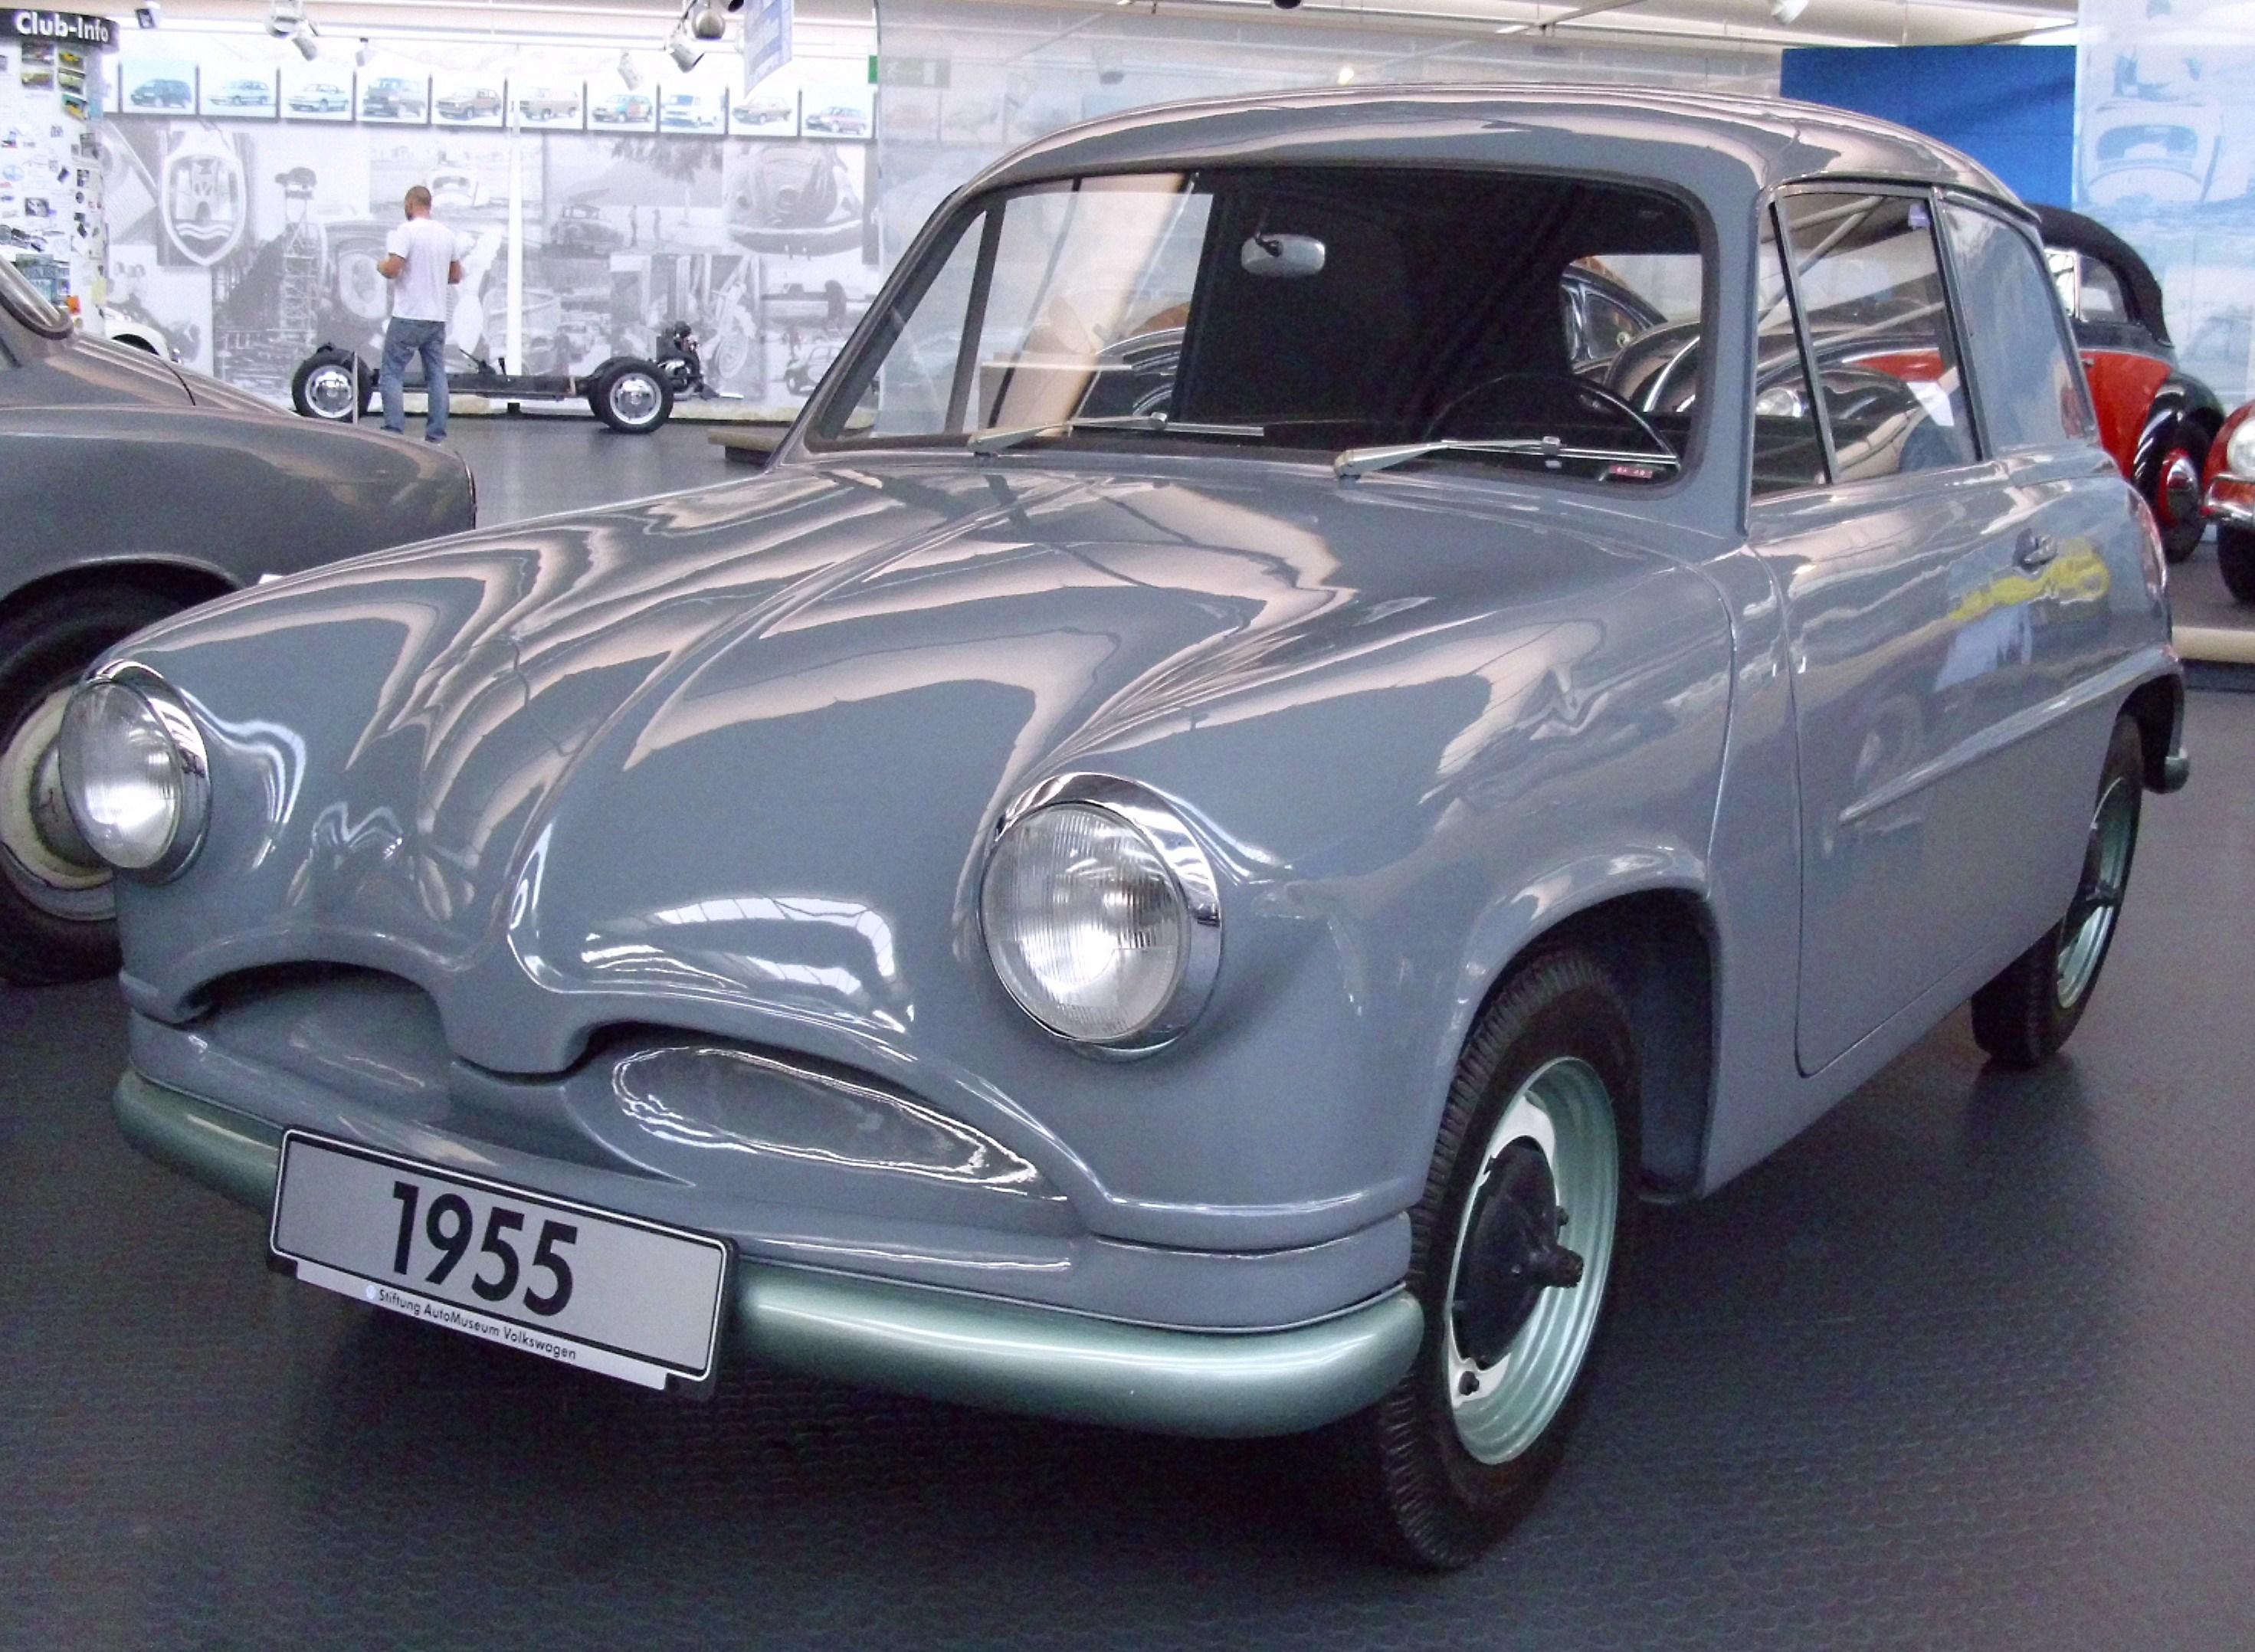 VW_EA_48_Prototyp_1955_(2).jpg